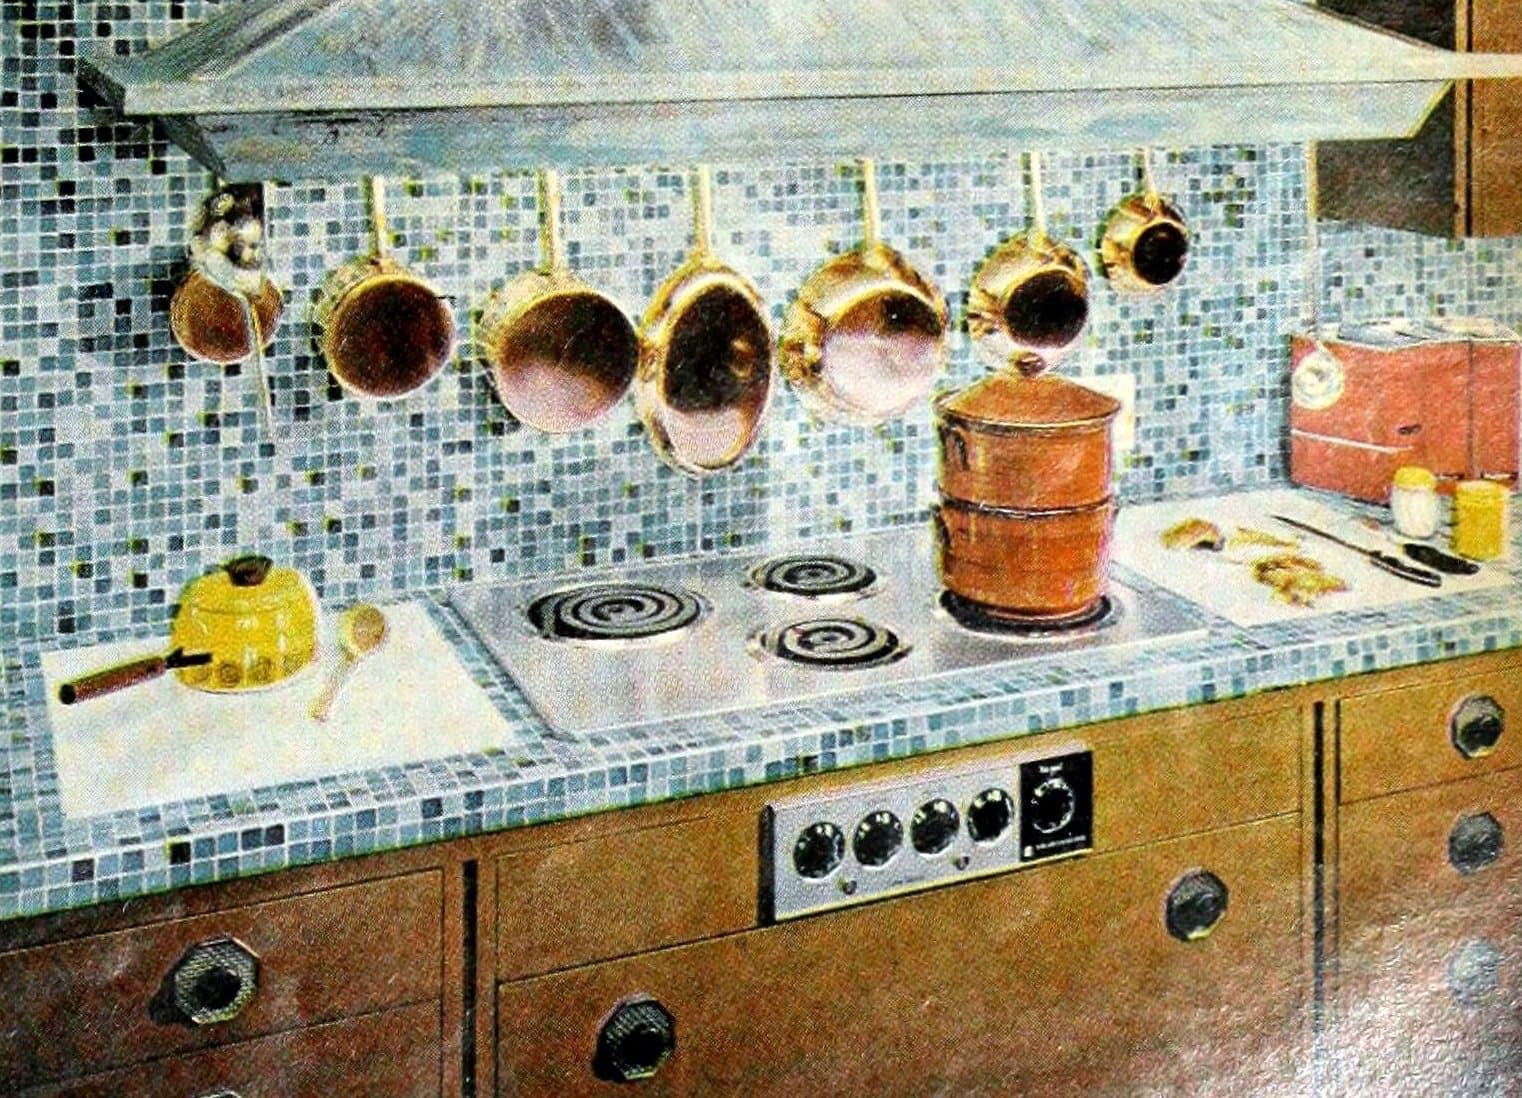 Retro 1960s ceramic mosaic tile design - kitchen countertop and backsplash